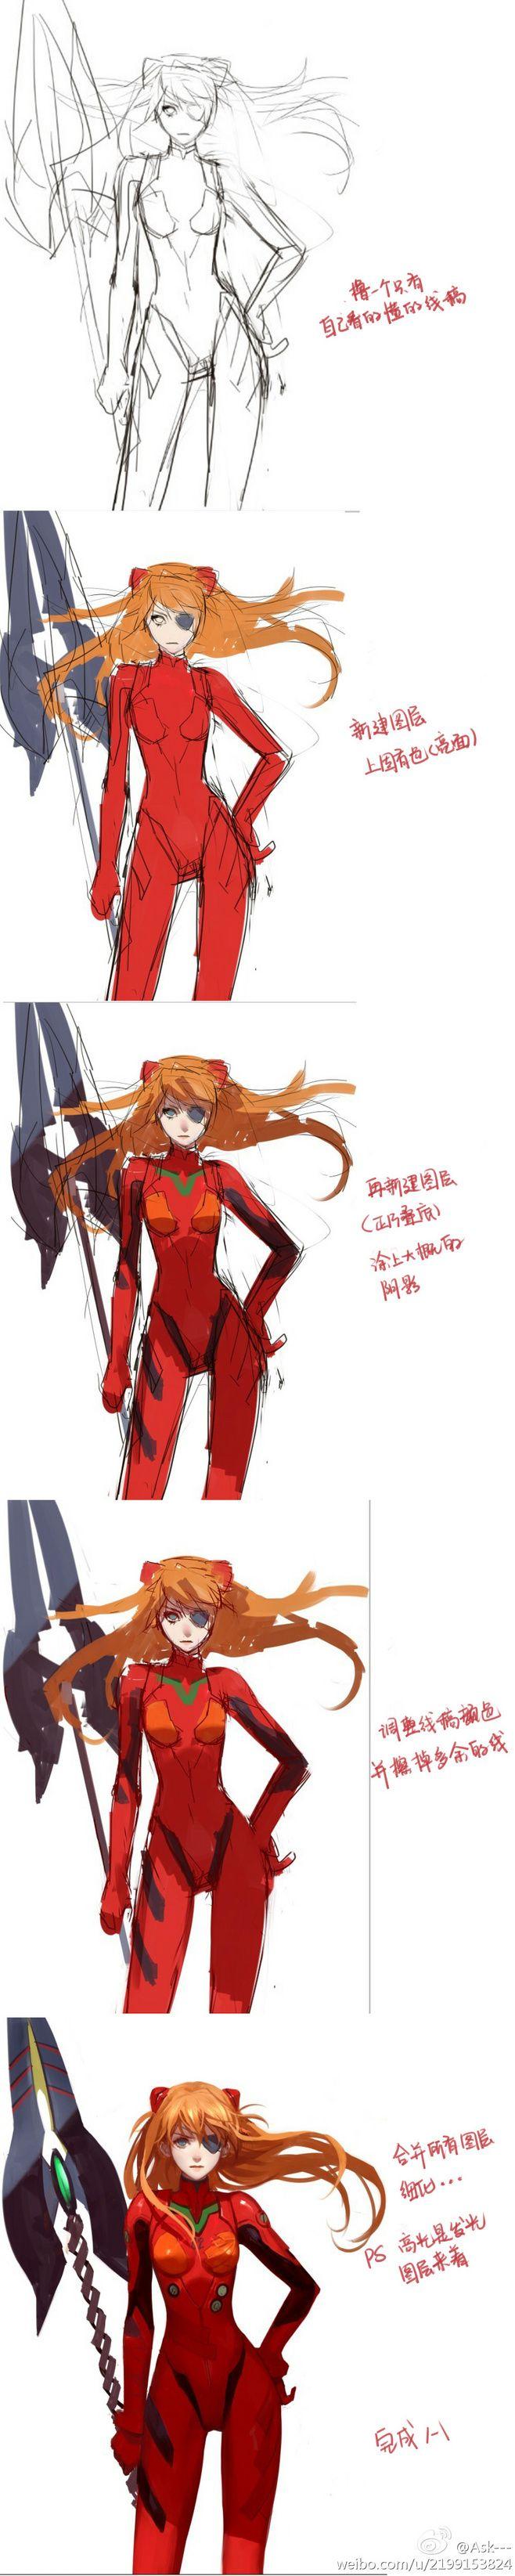 anime girl process